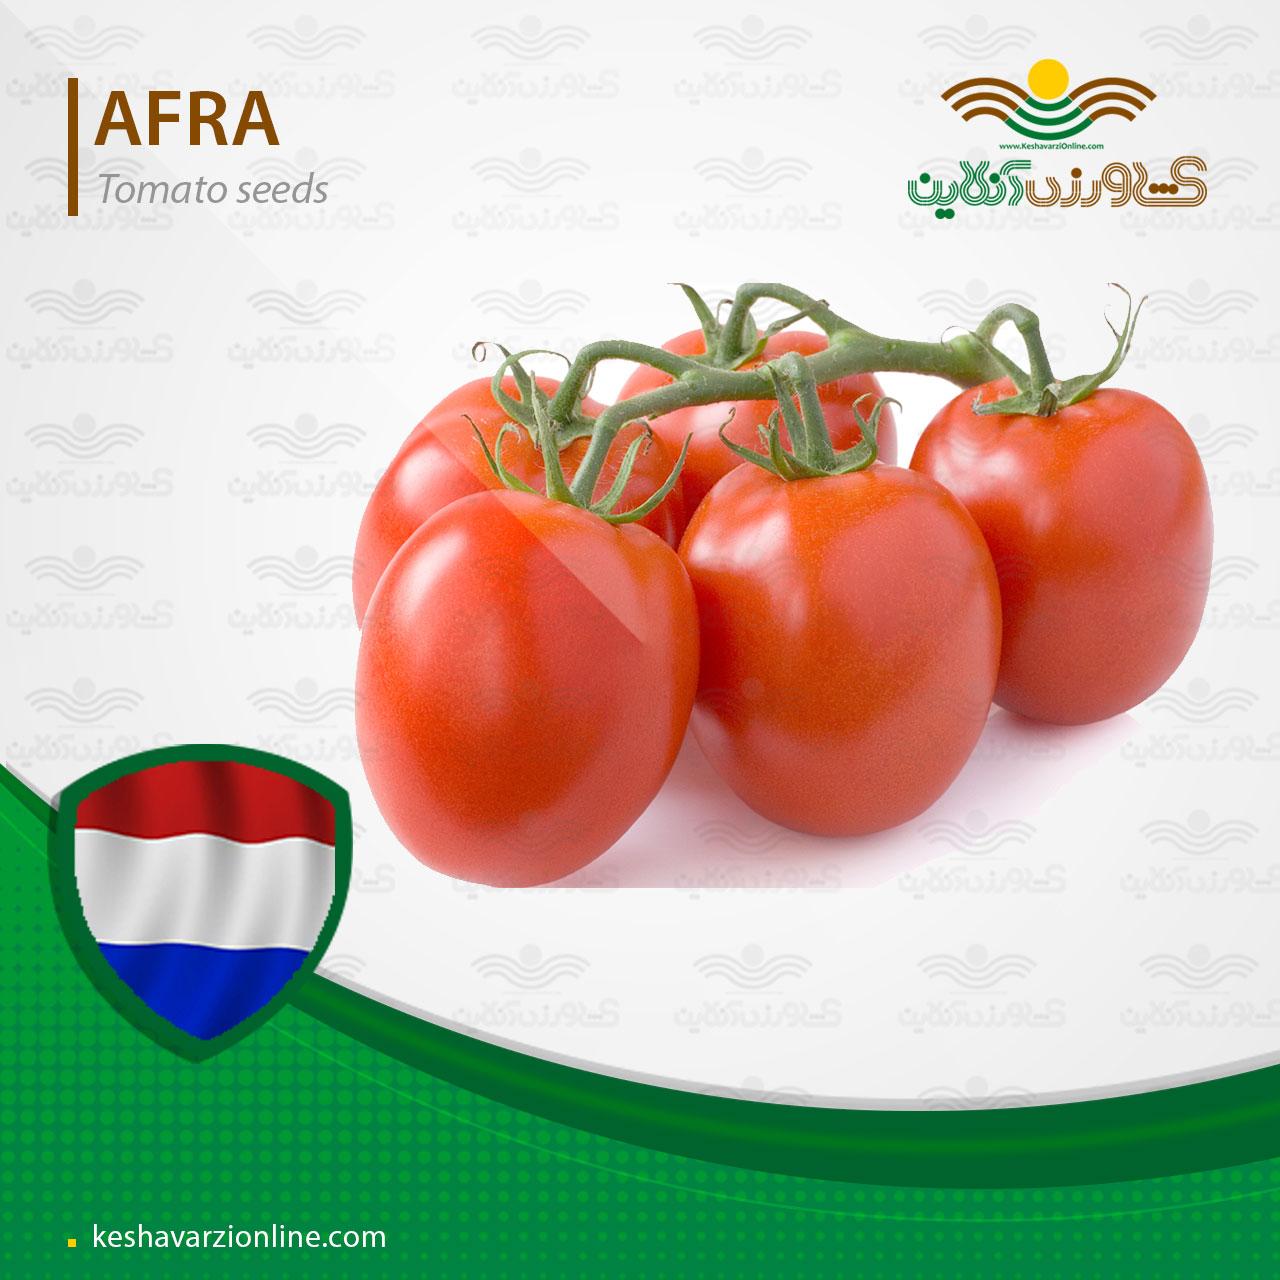 بذر گوجه فرنگی افرا